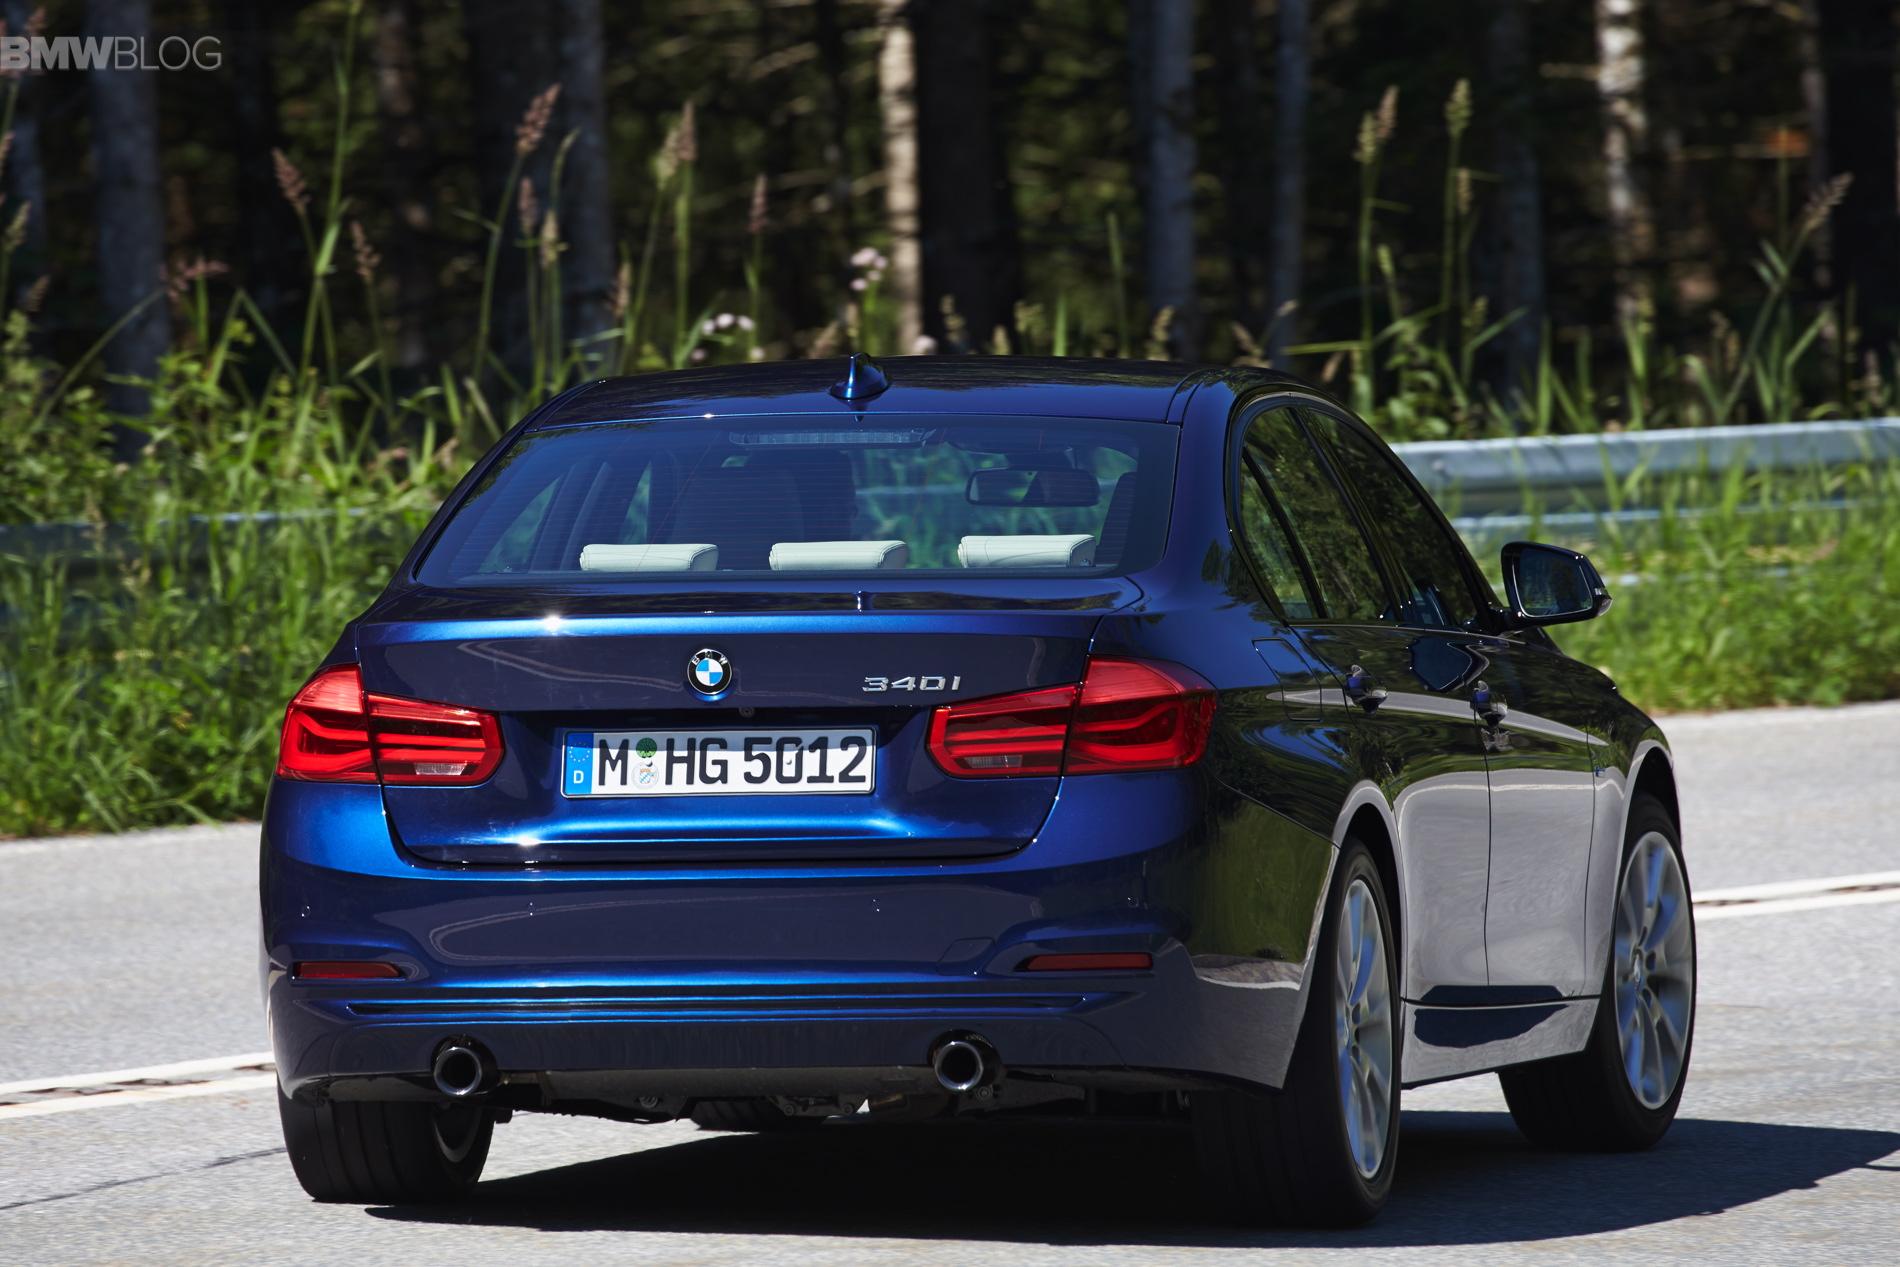 2017 Bmw 335i >> 2015 BMW 340i - Driving Impressions